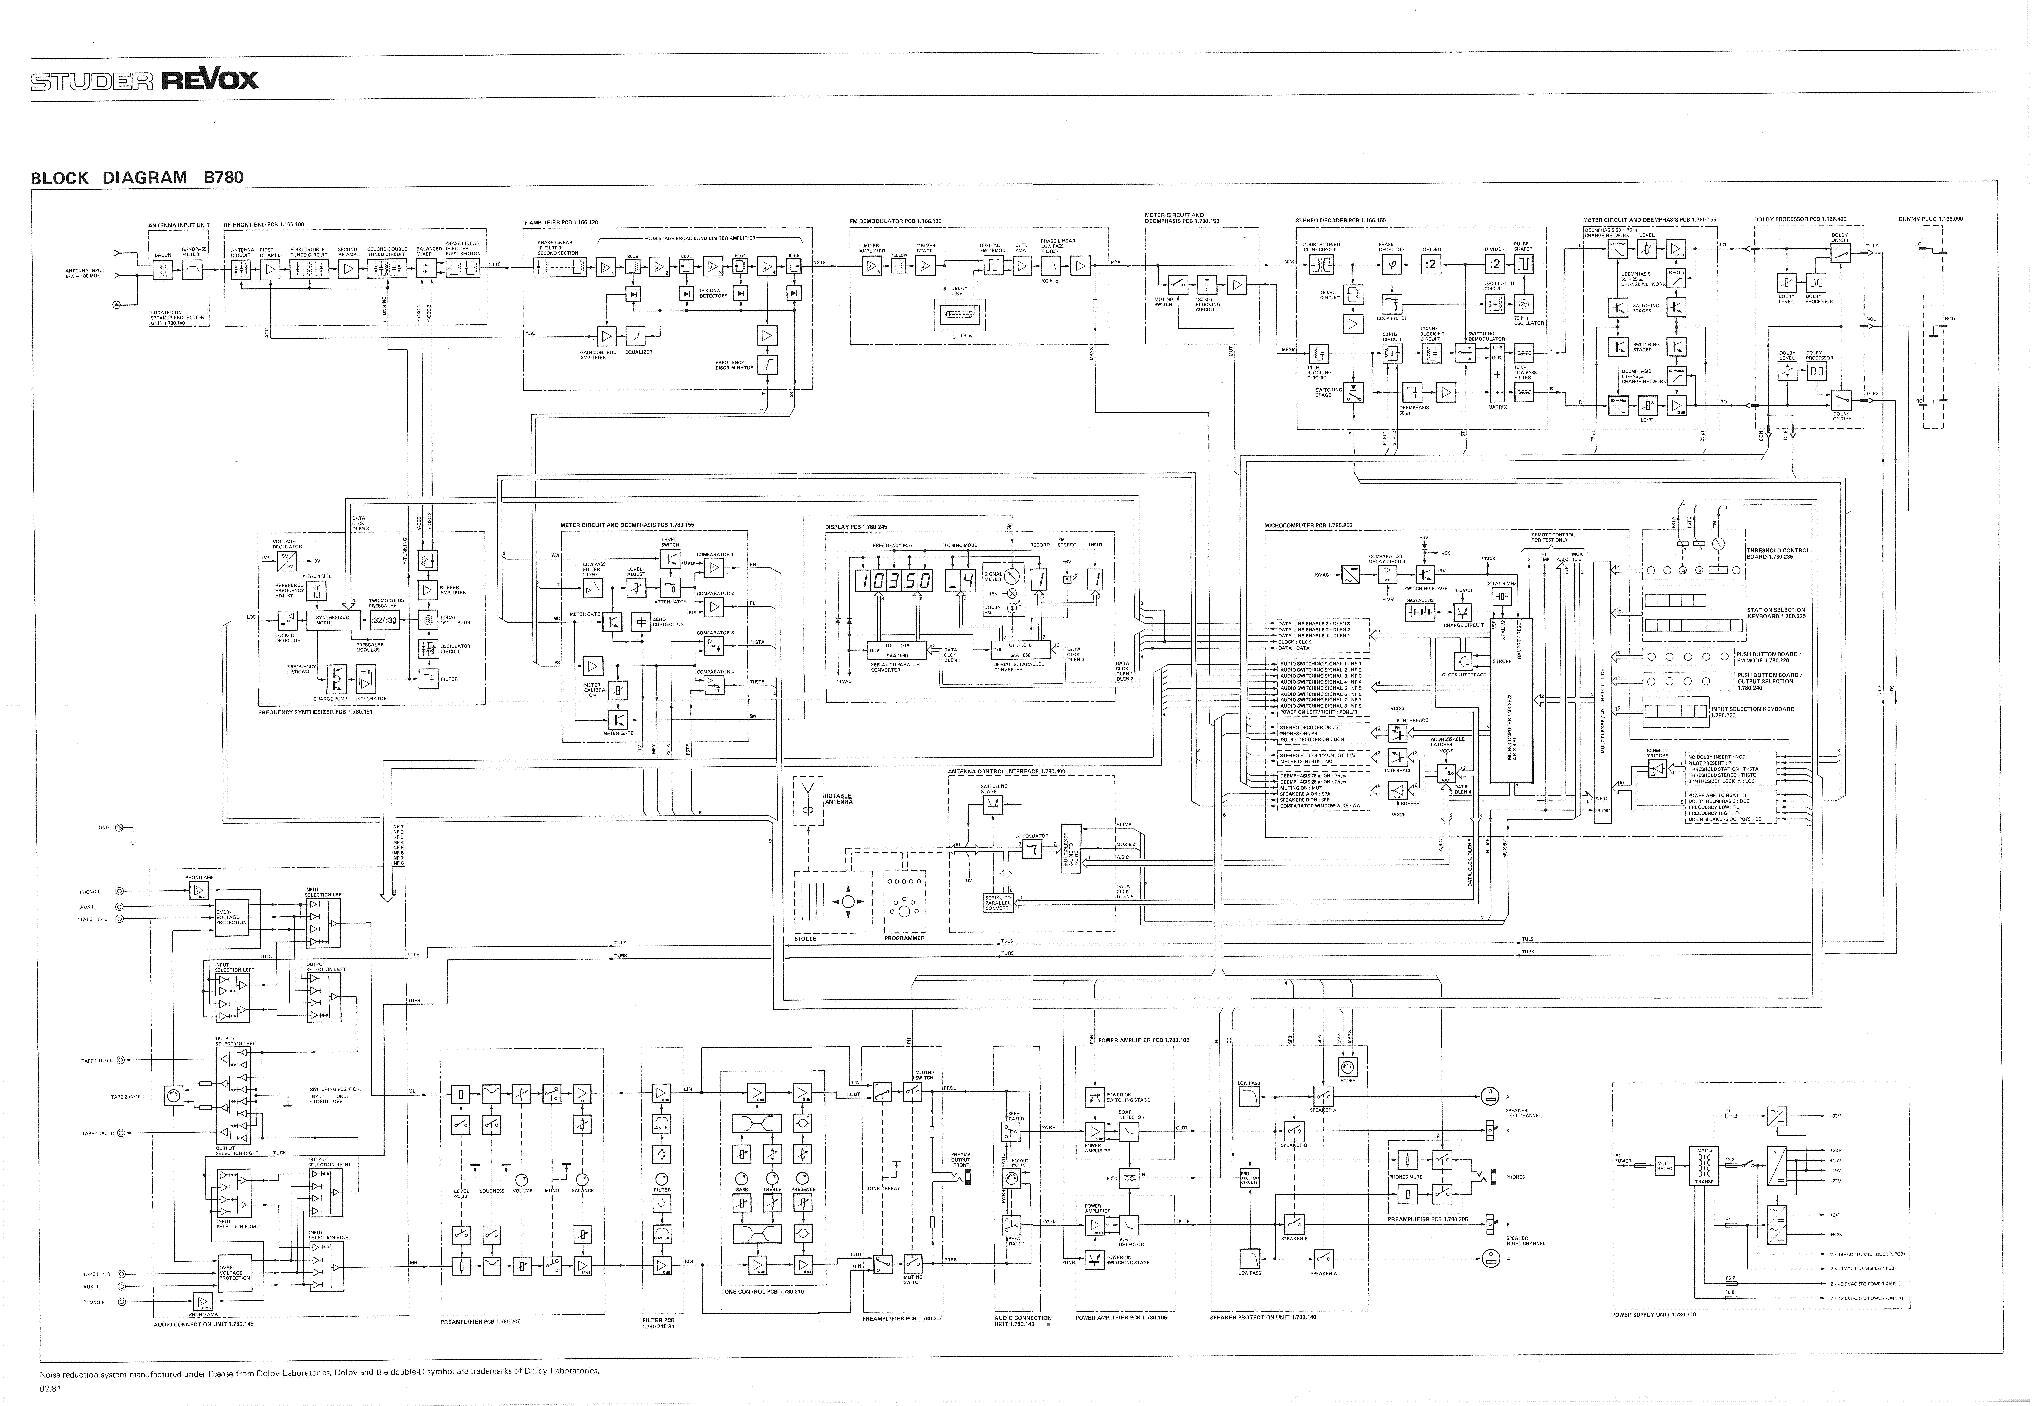 Studer Revox B780 Block Diagram Sch Service Manual